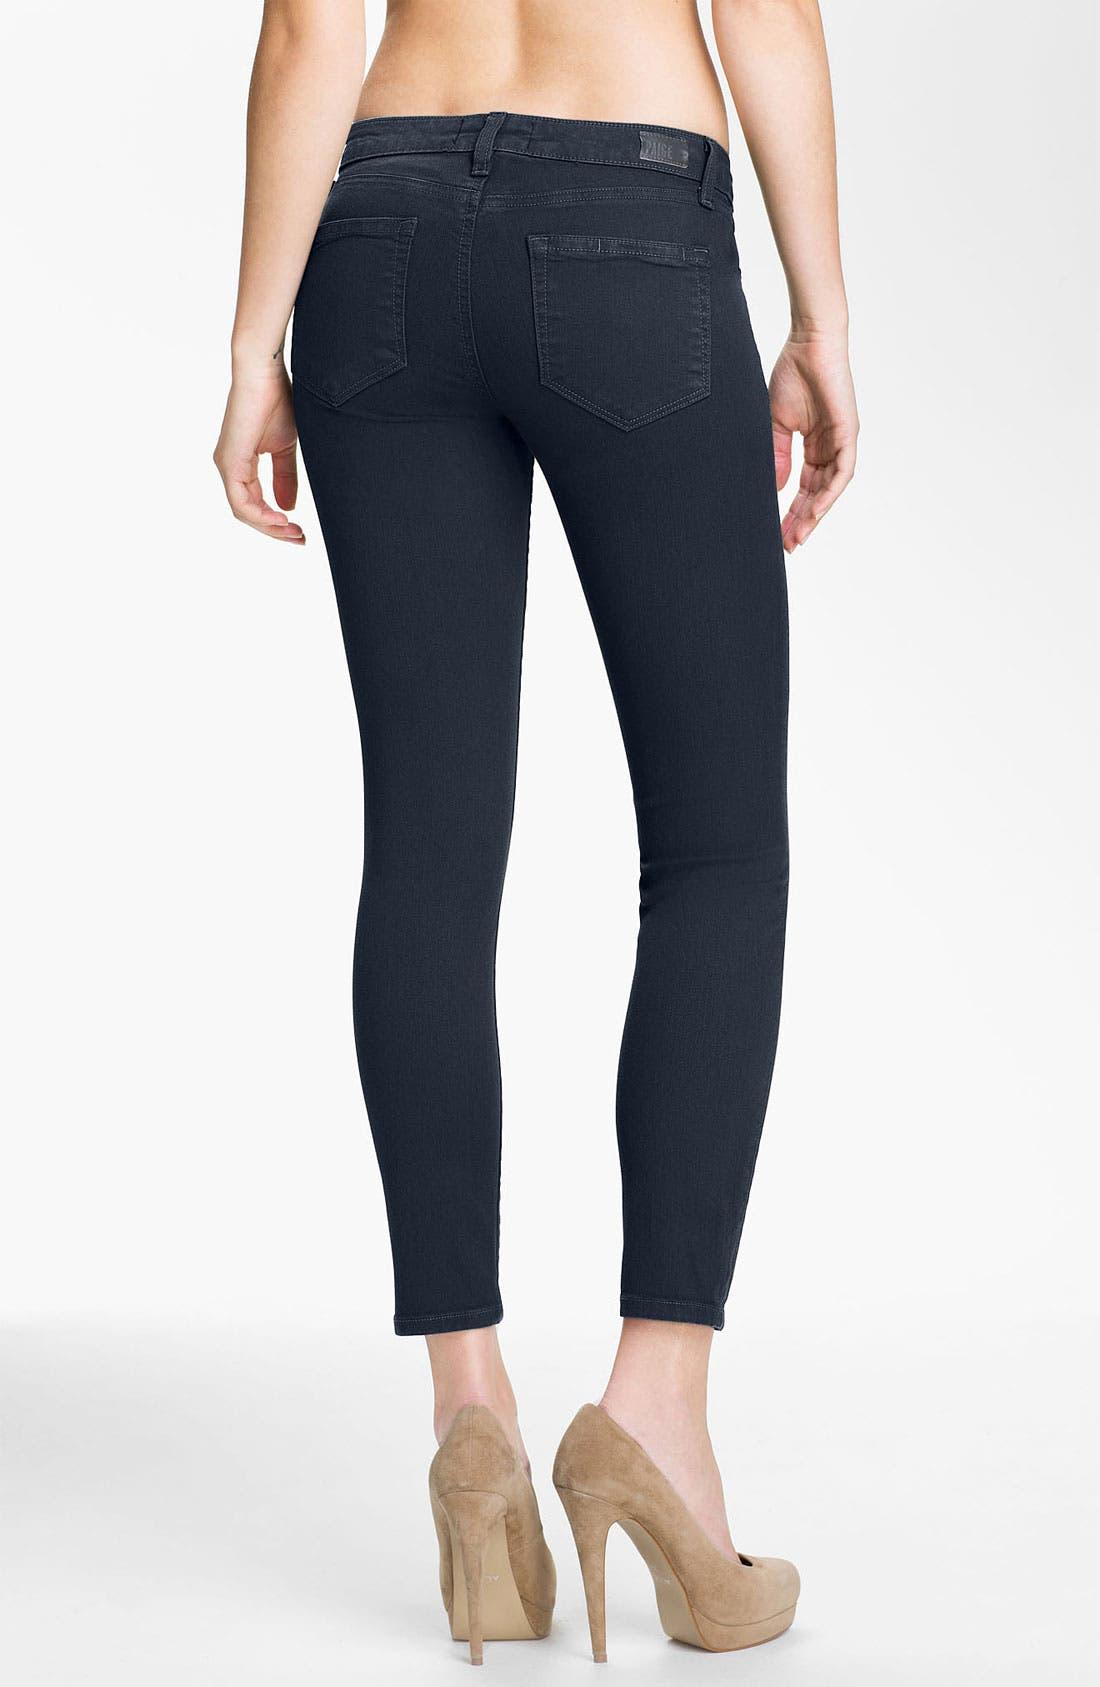 Alternate Image 2  - Paige Denim 'Skyline' Ankle Peg Skinny Stretch Jeans (Drift)